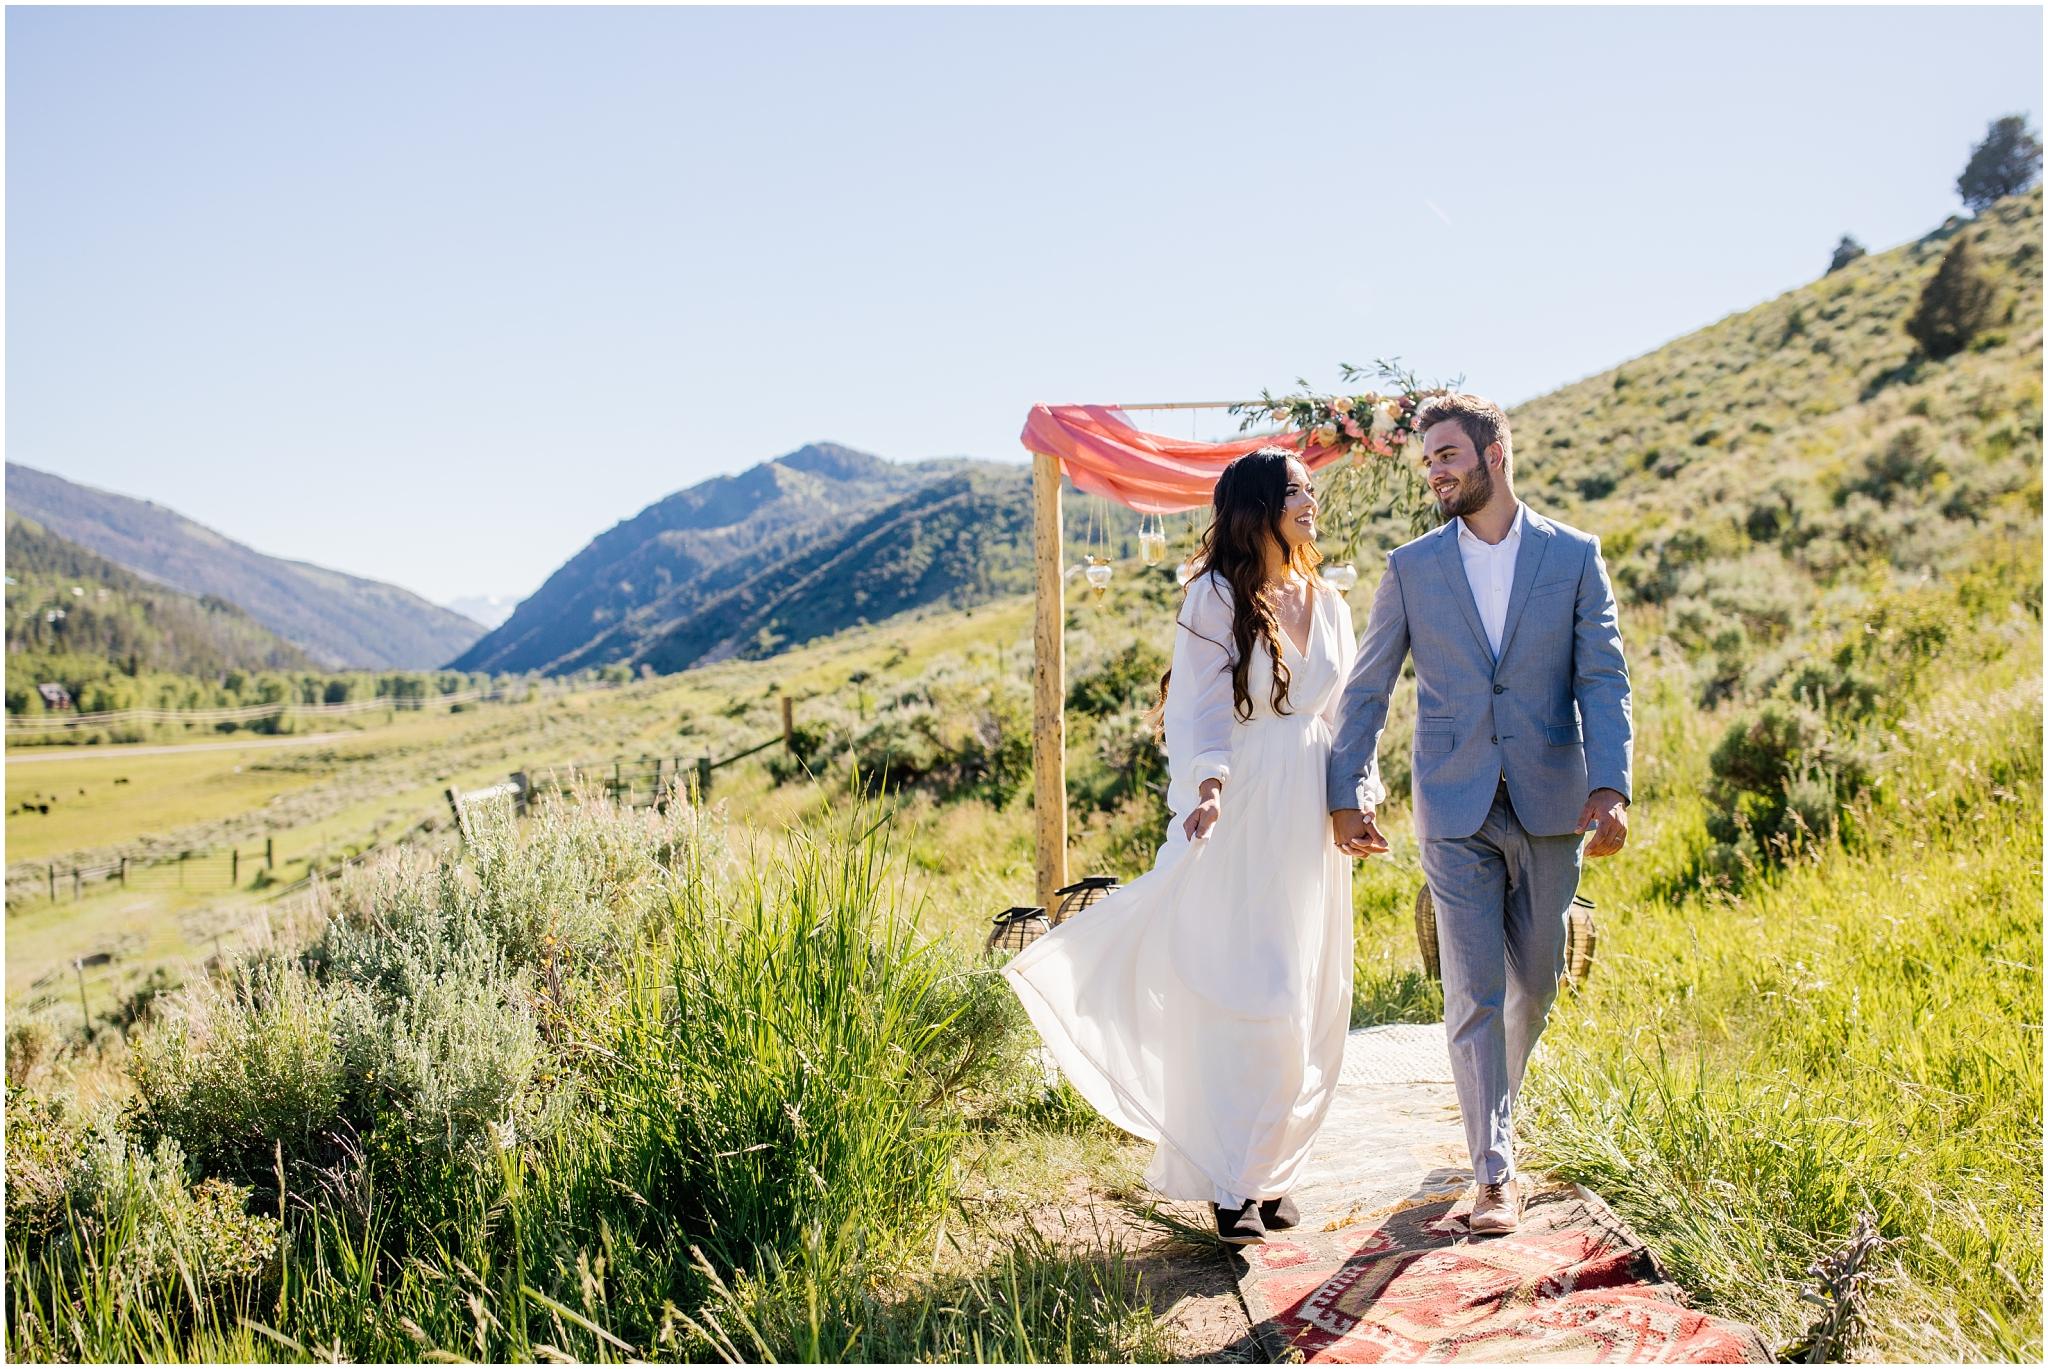 MountainShoot-51_Lizzie-B-Imagery-Utah-Wedding-Photographer-Salt-Lake-City-Park-City-Utah-County.jpg